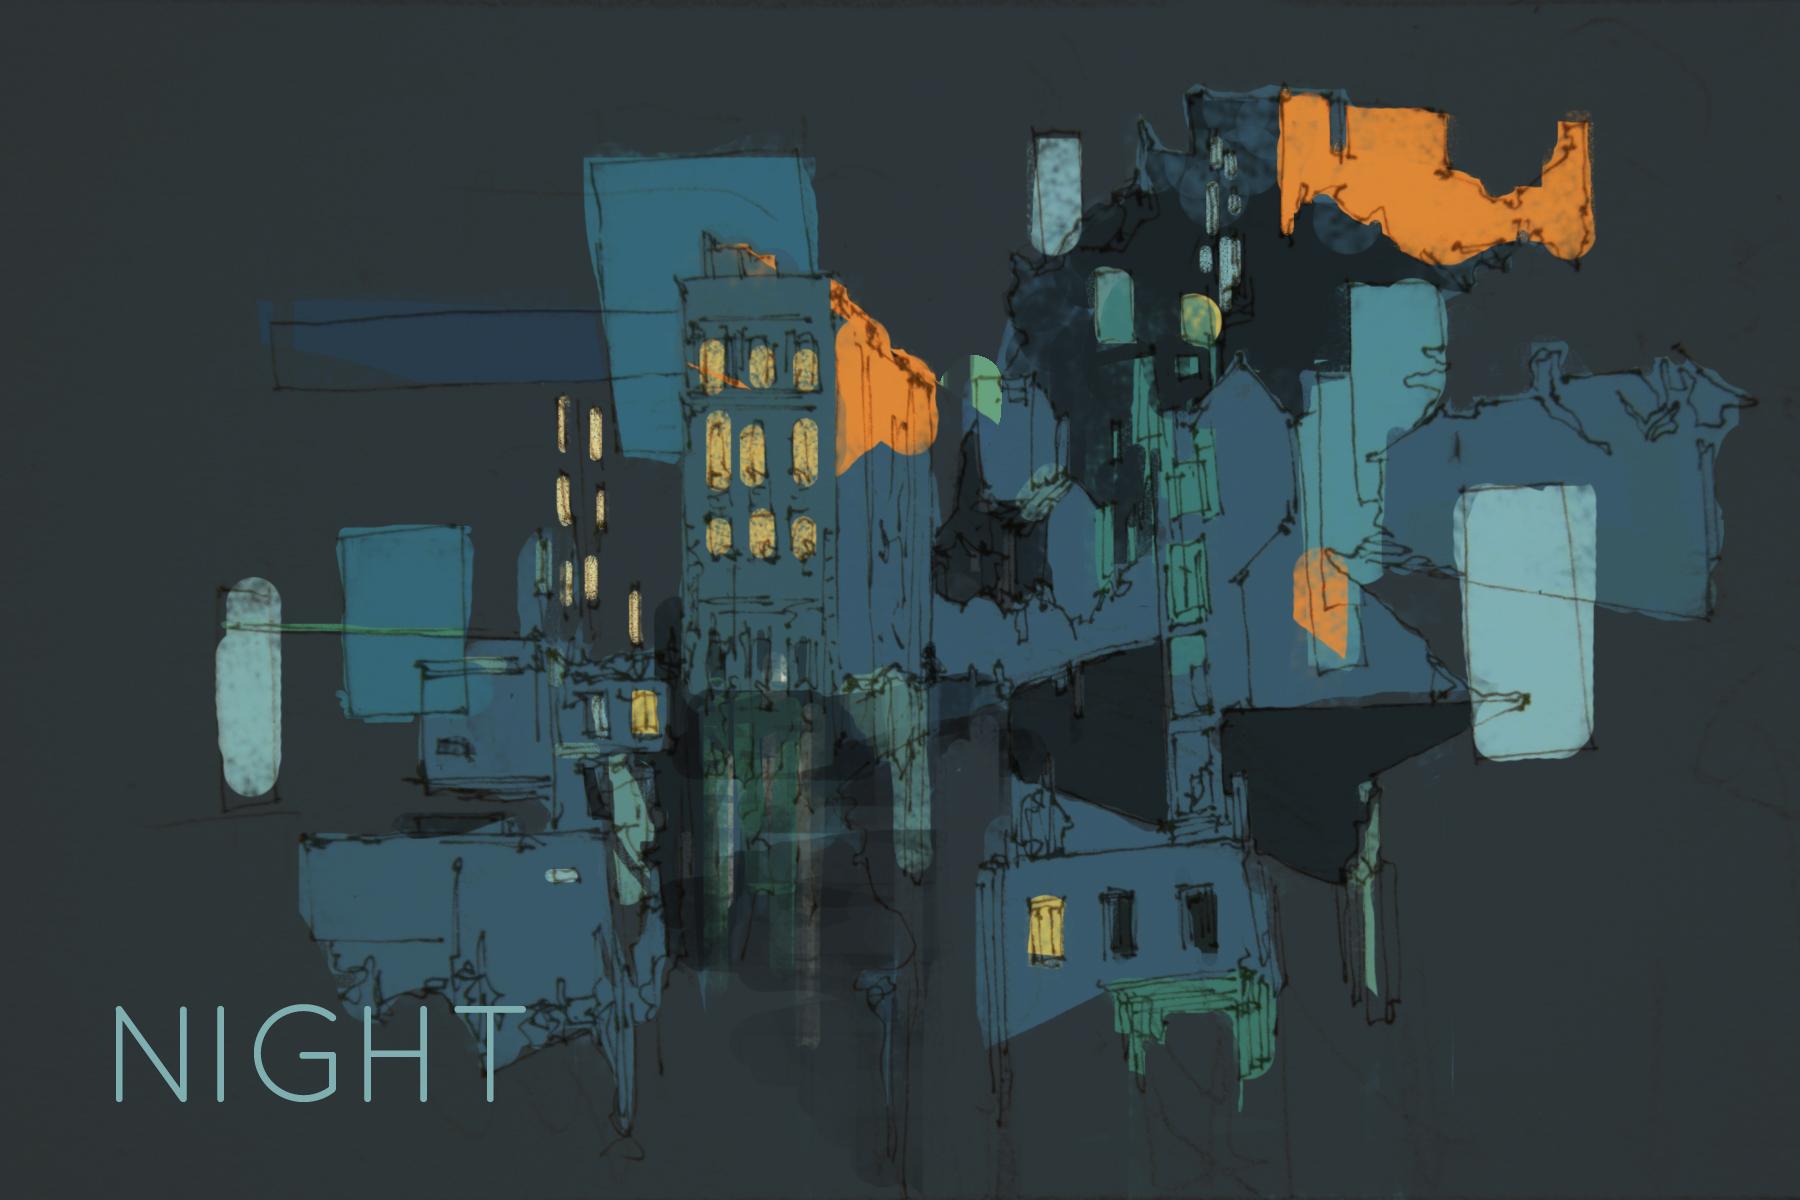 9-night.jpg